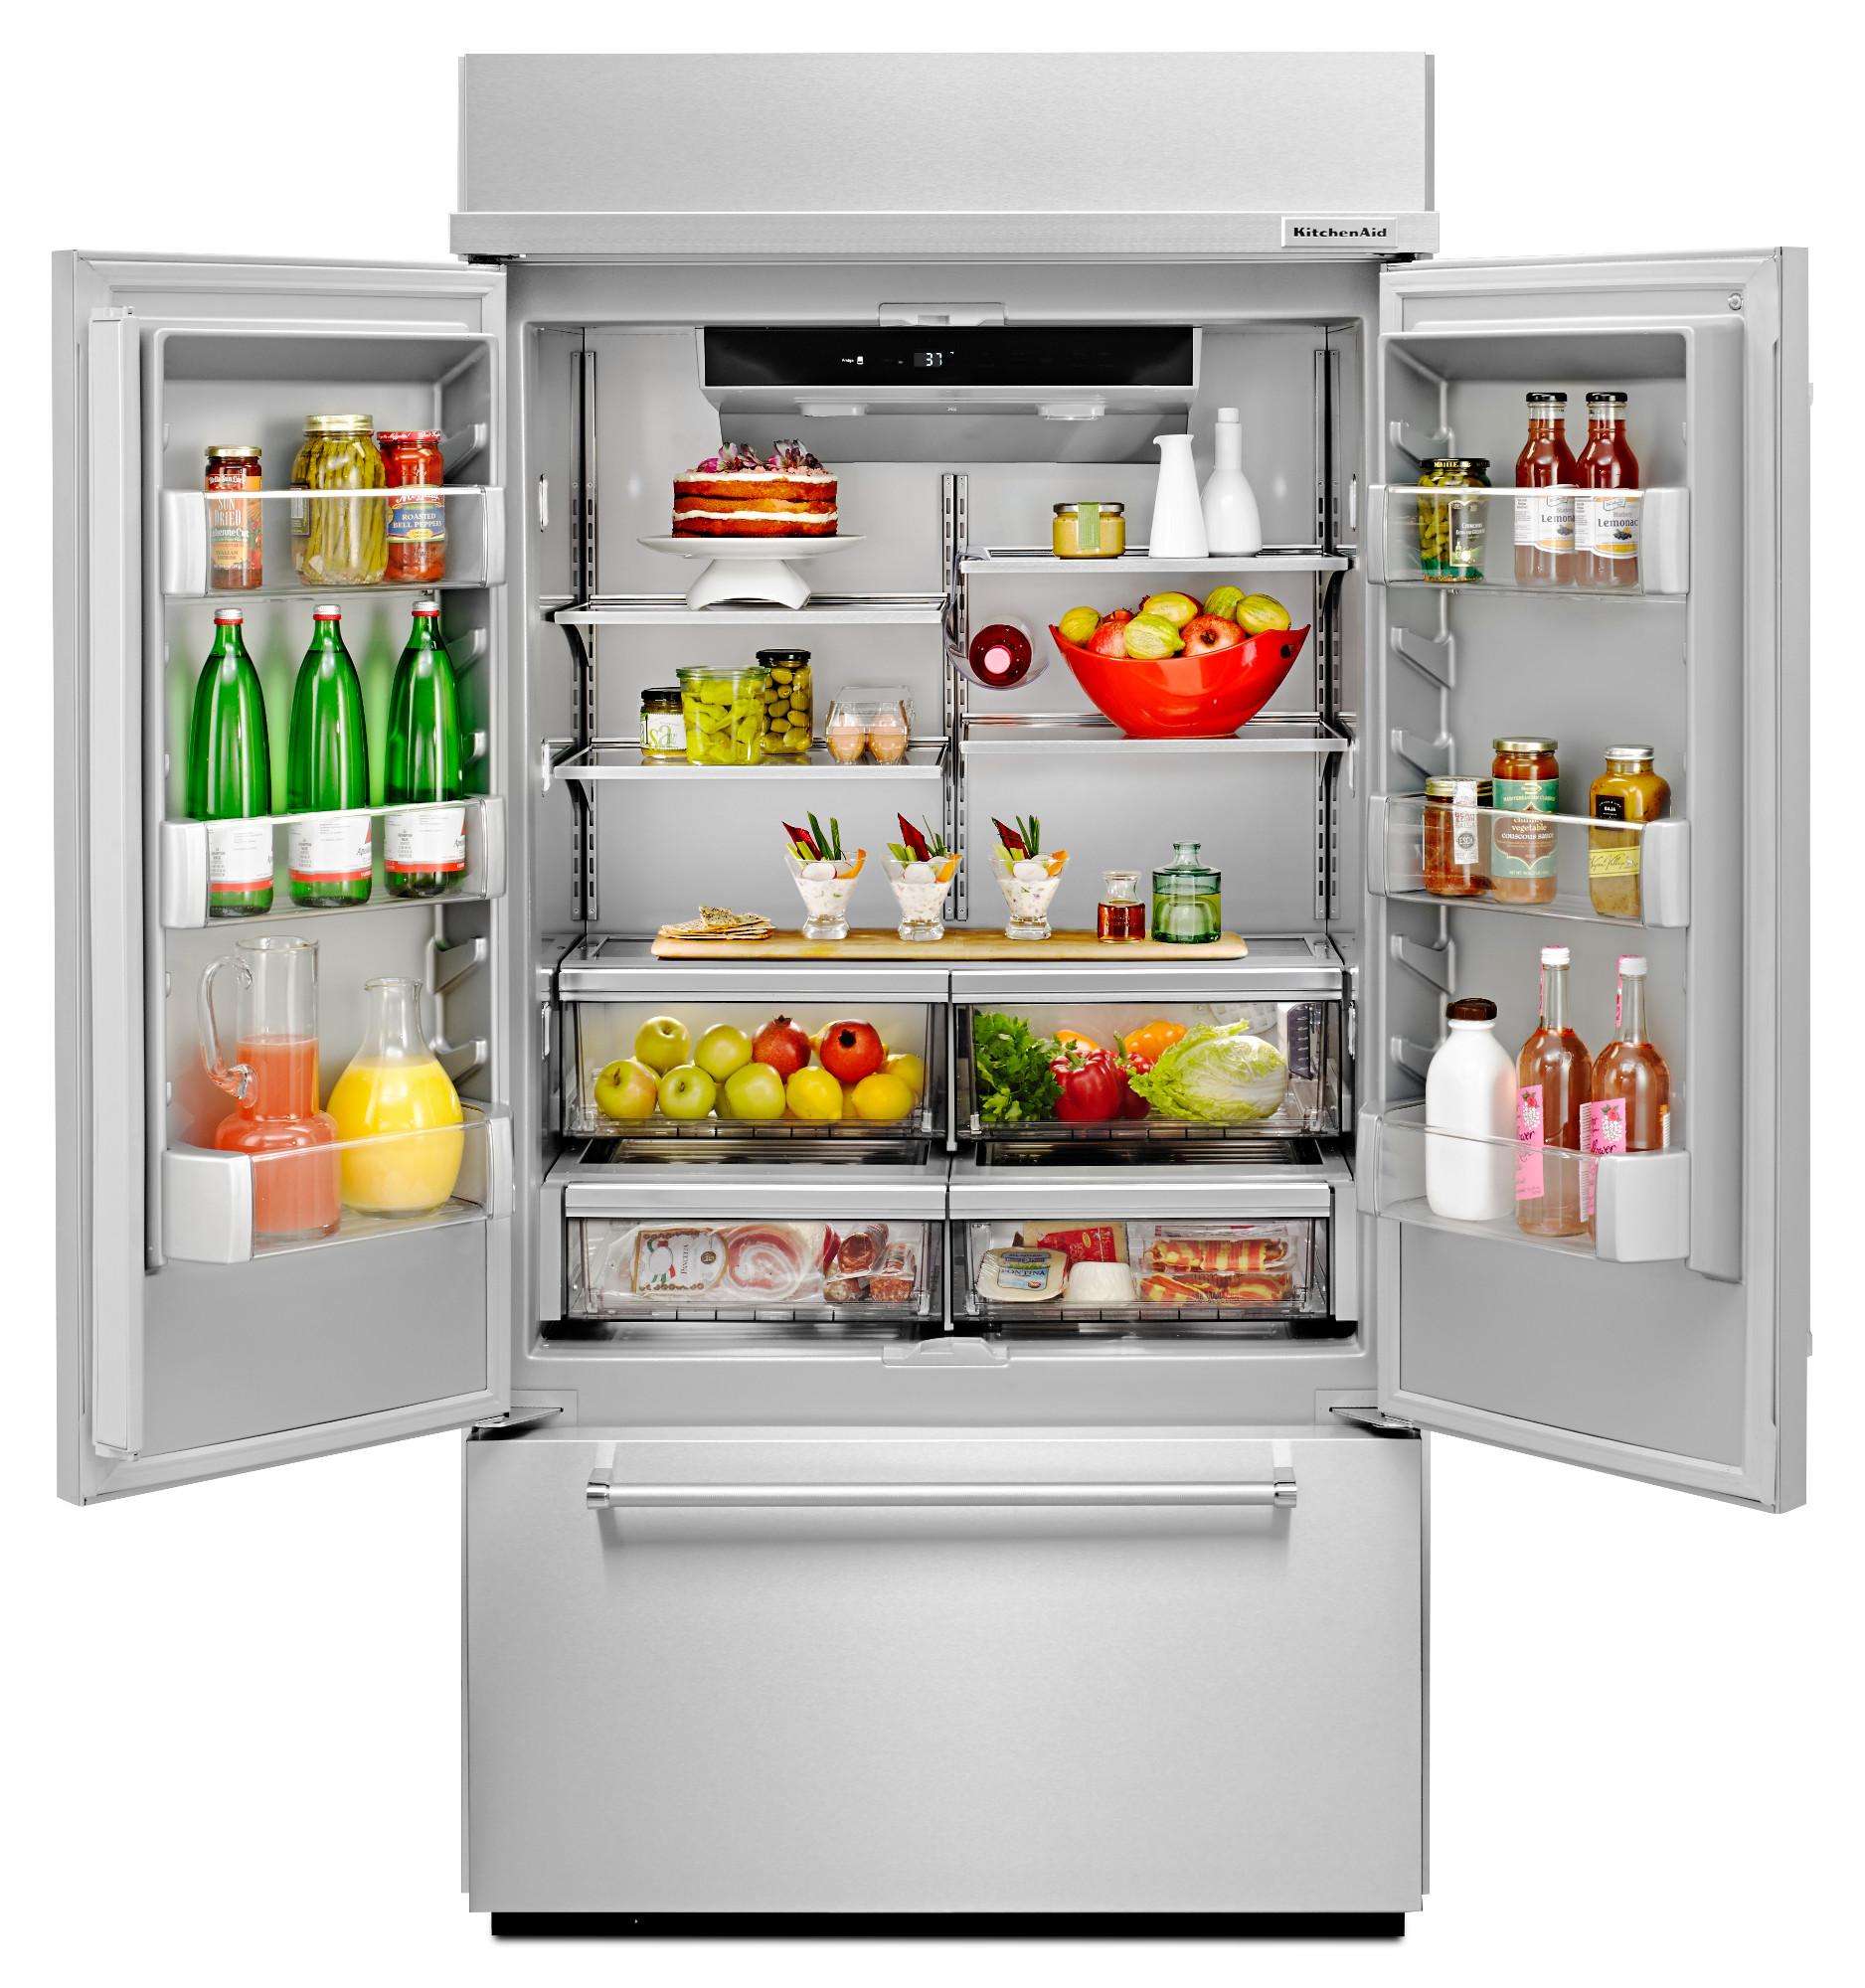 KitchenAid KBFN502ESS 24.2 cu. ft. Built-In French Door Refrigerator - Stainless Steel